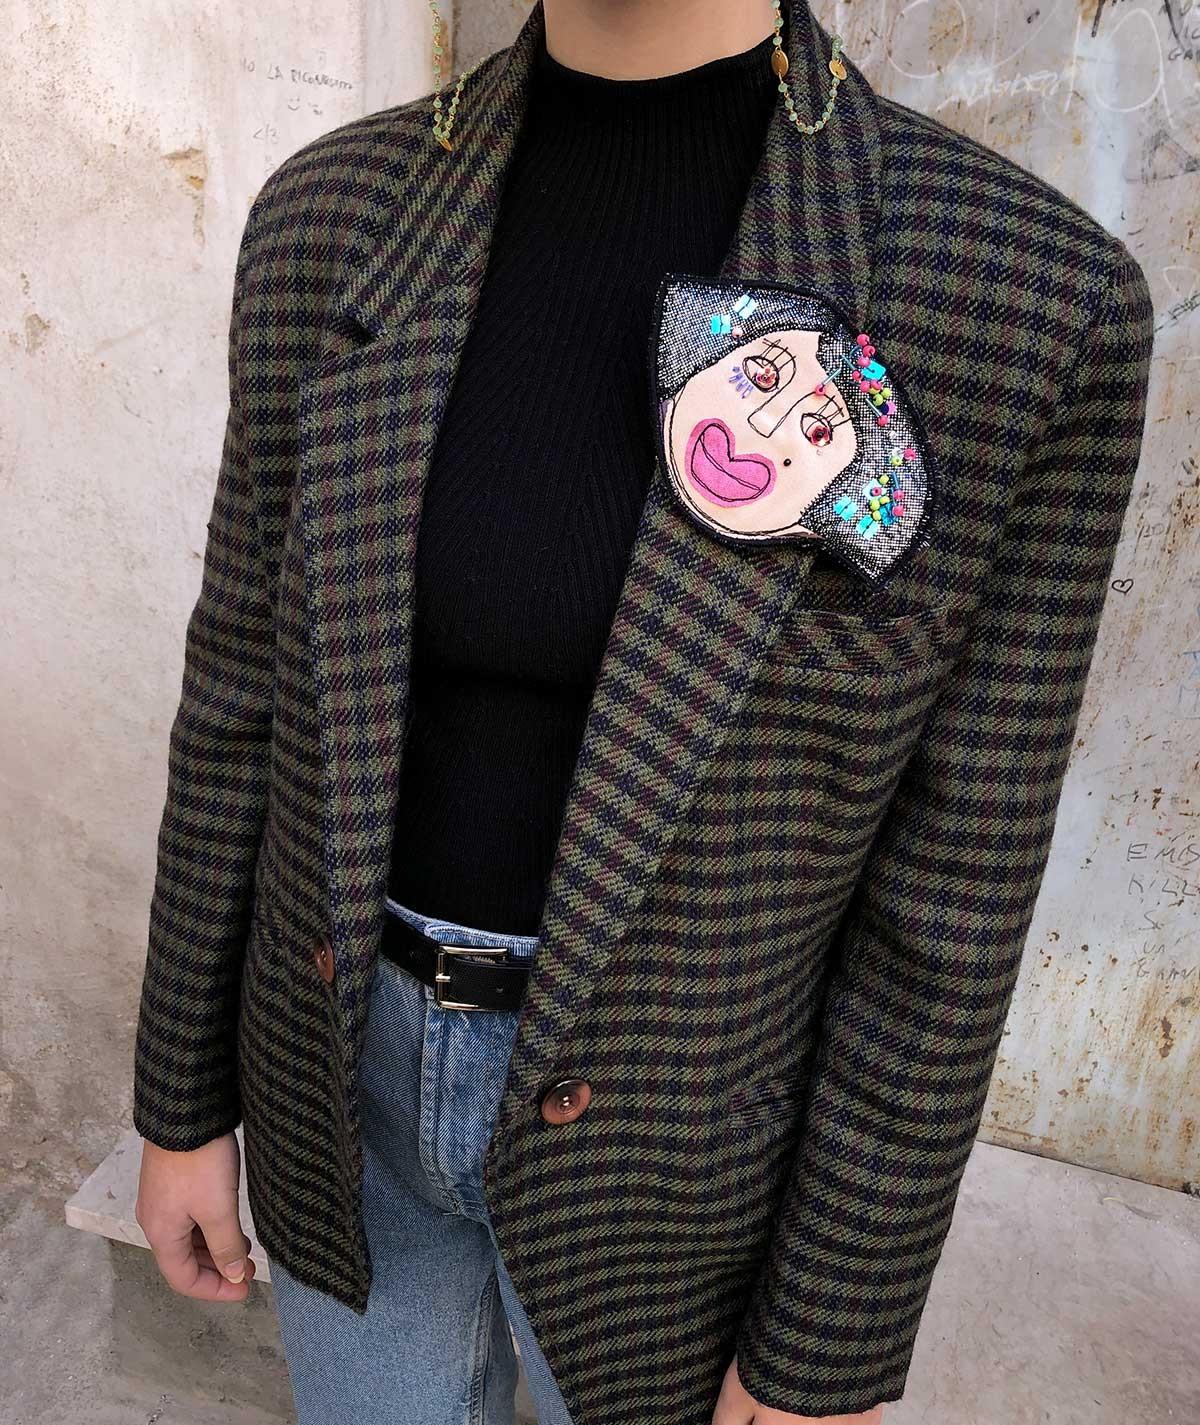 Chiara - fabric brooch